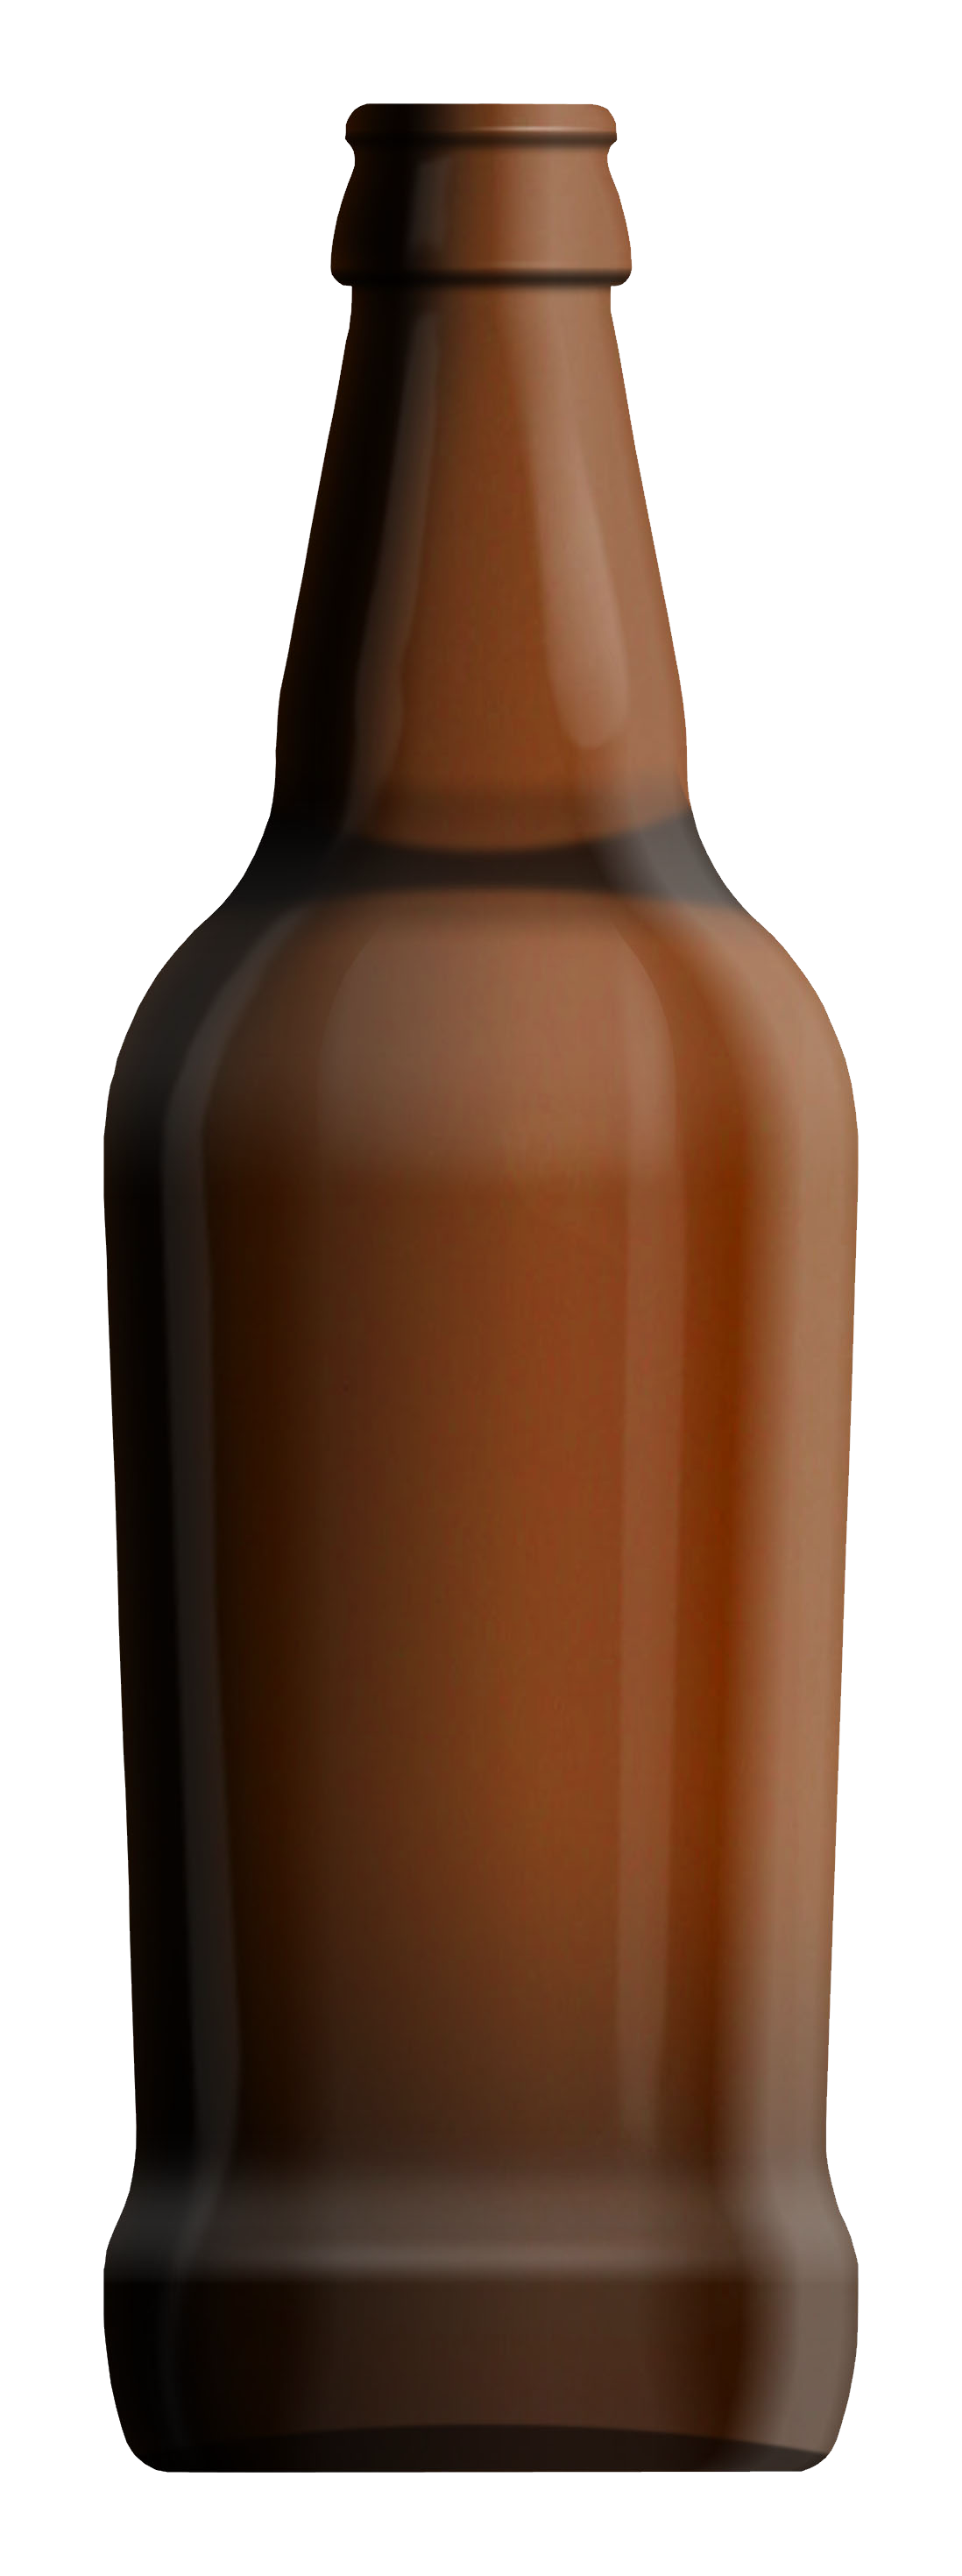 Images free download beer. Empty bottle png